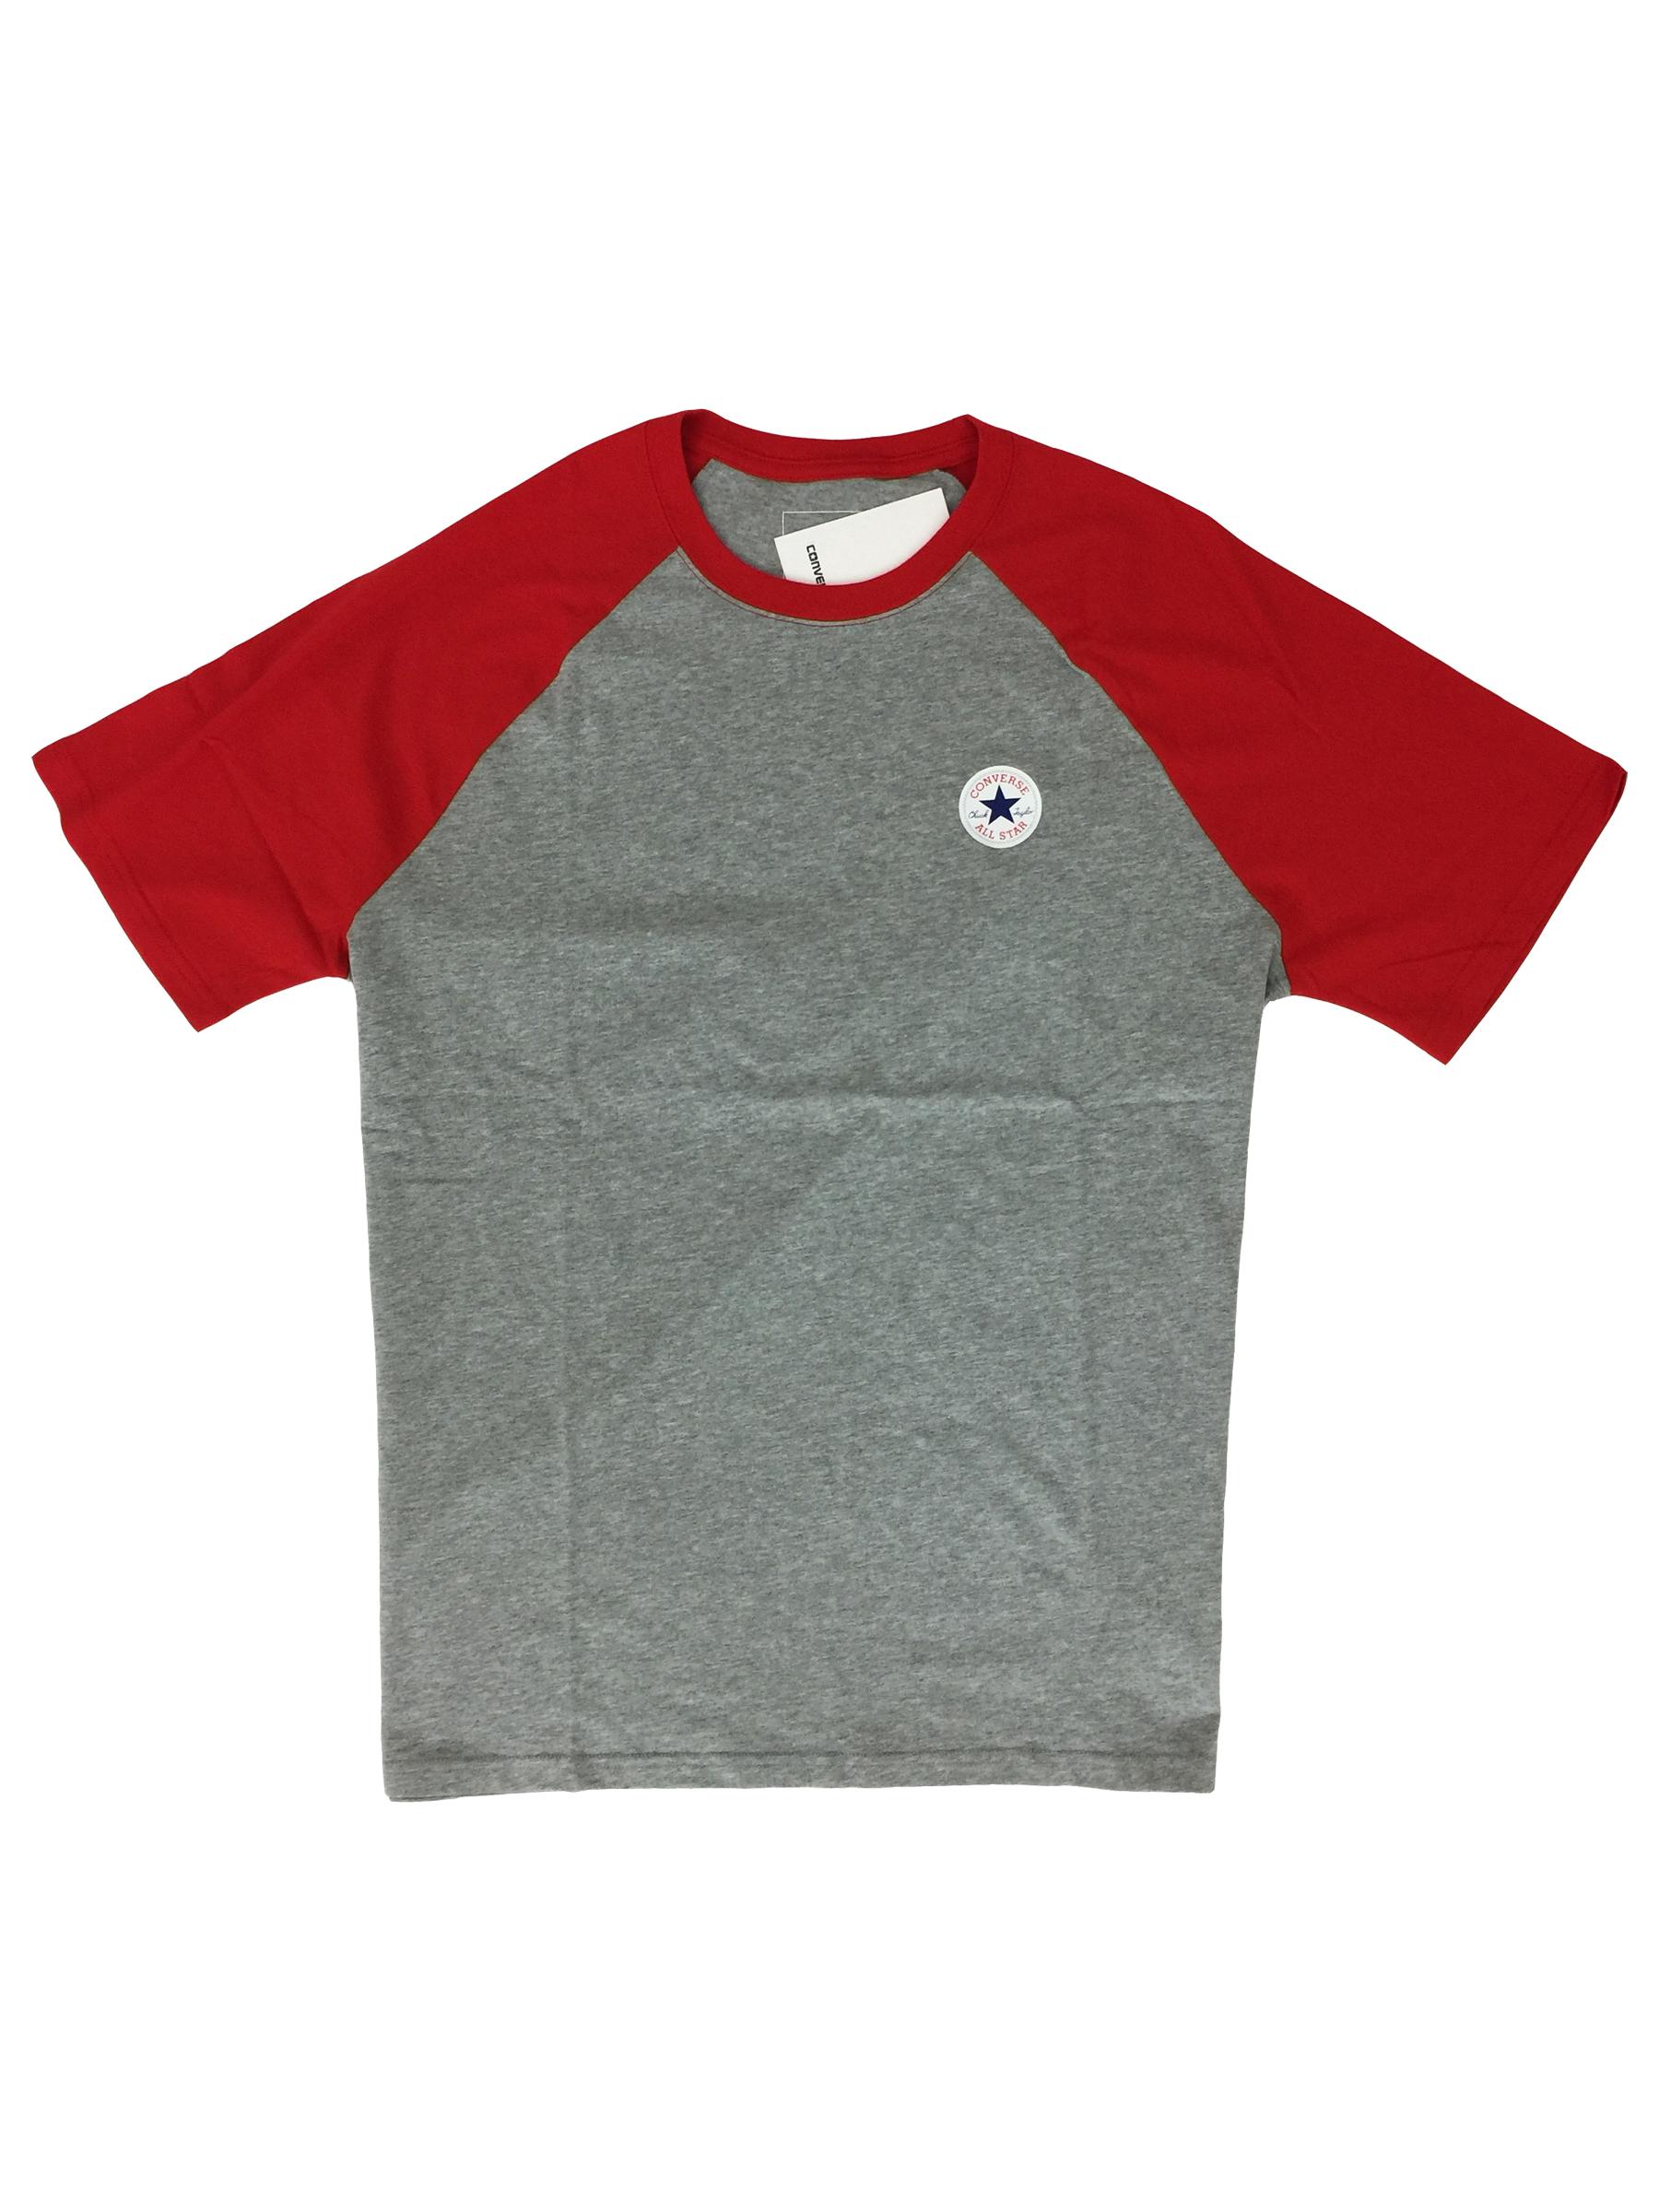 Detalles de Converse All Star hombre camiseta algodón en rojo GRIS XL